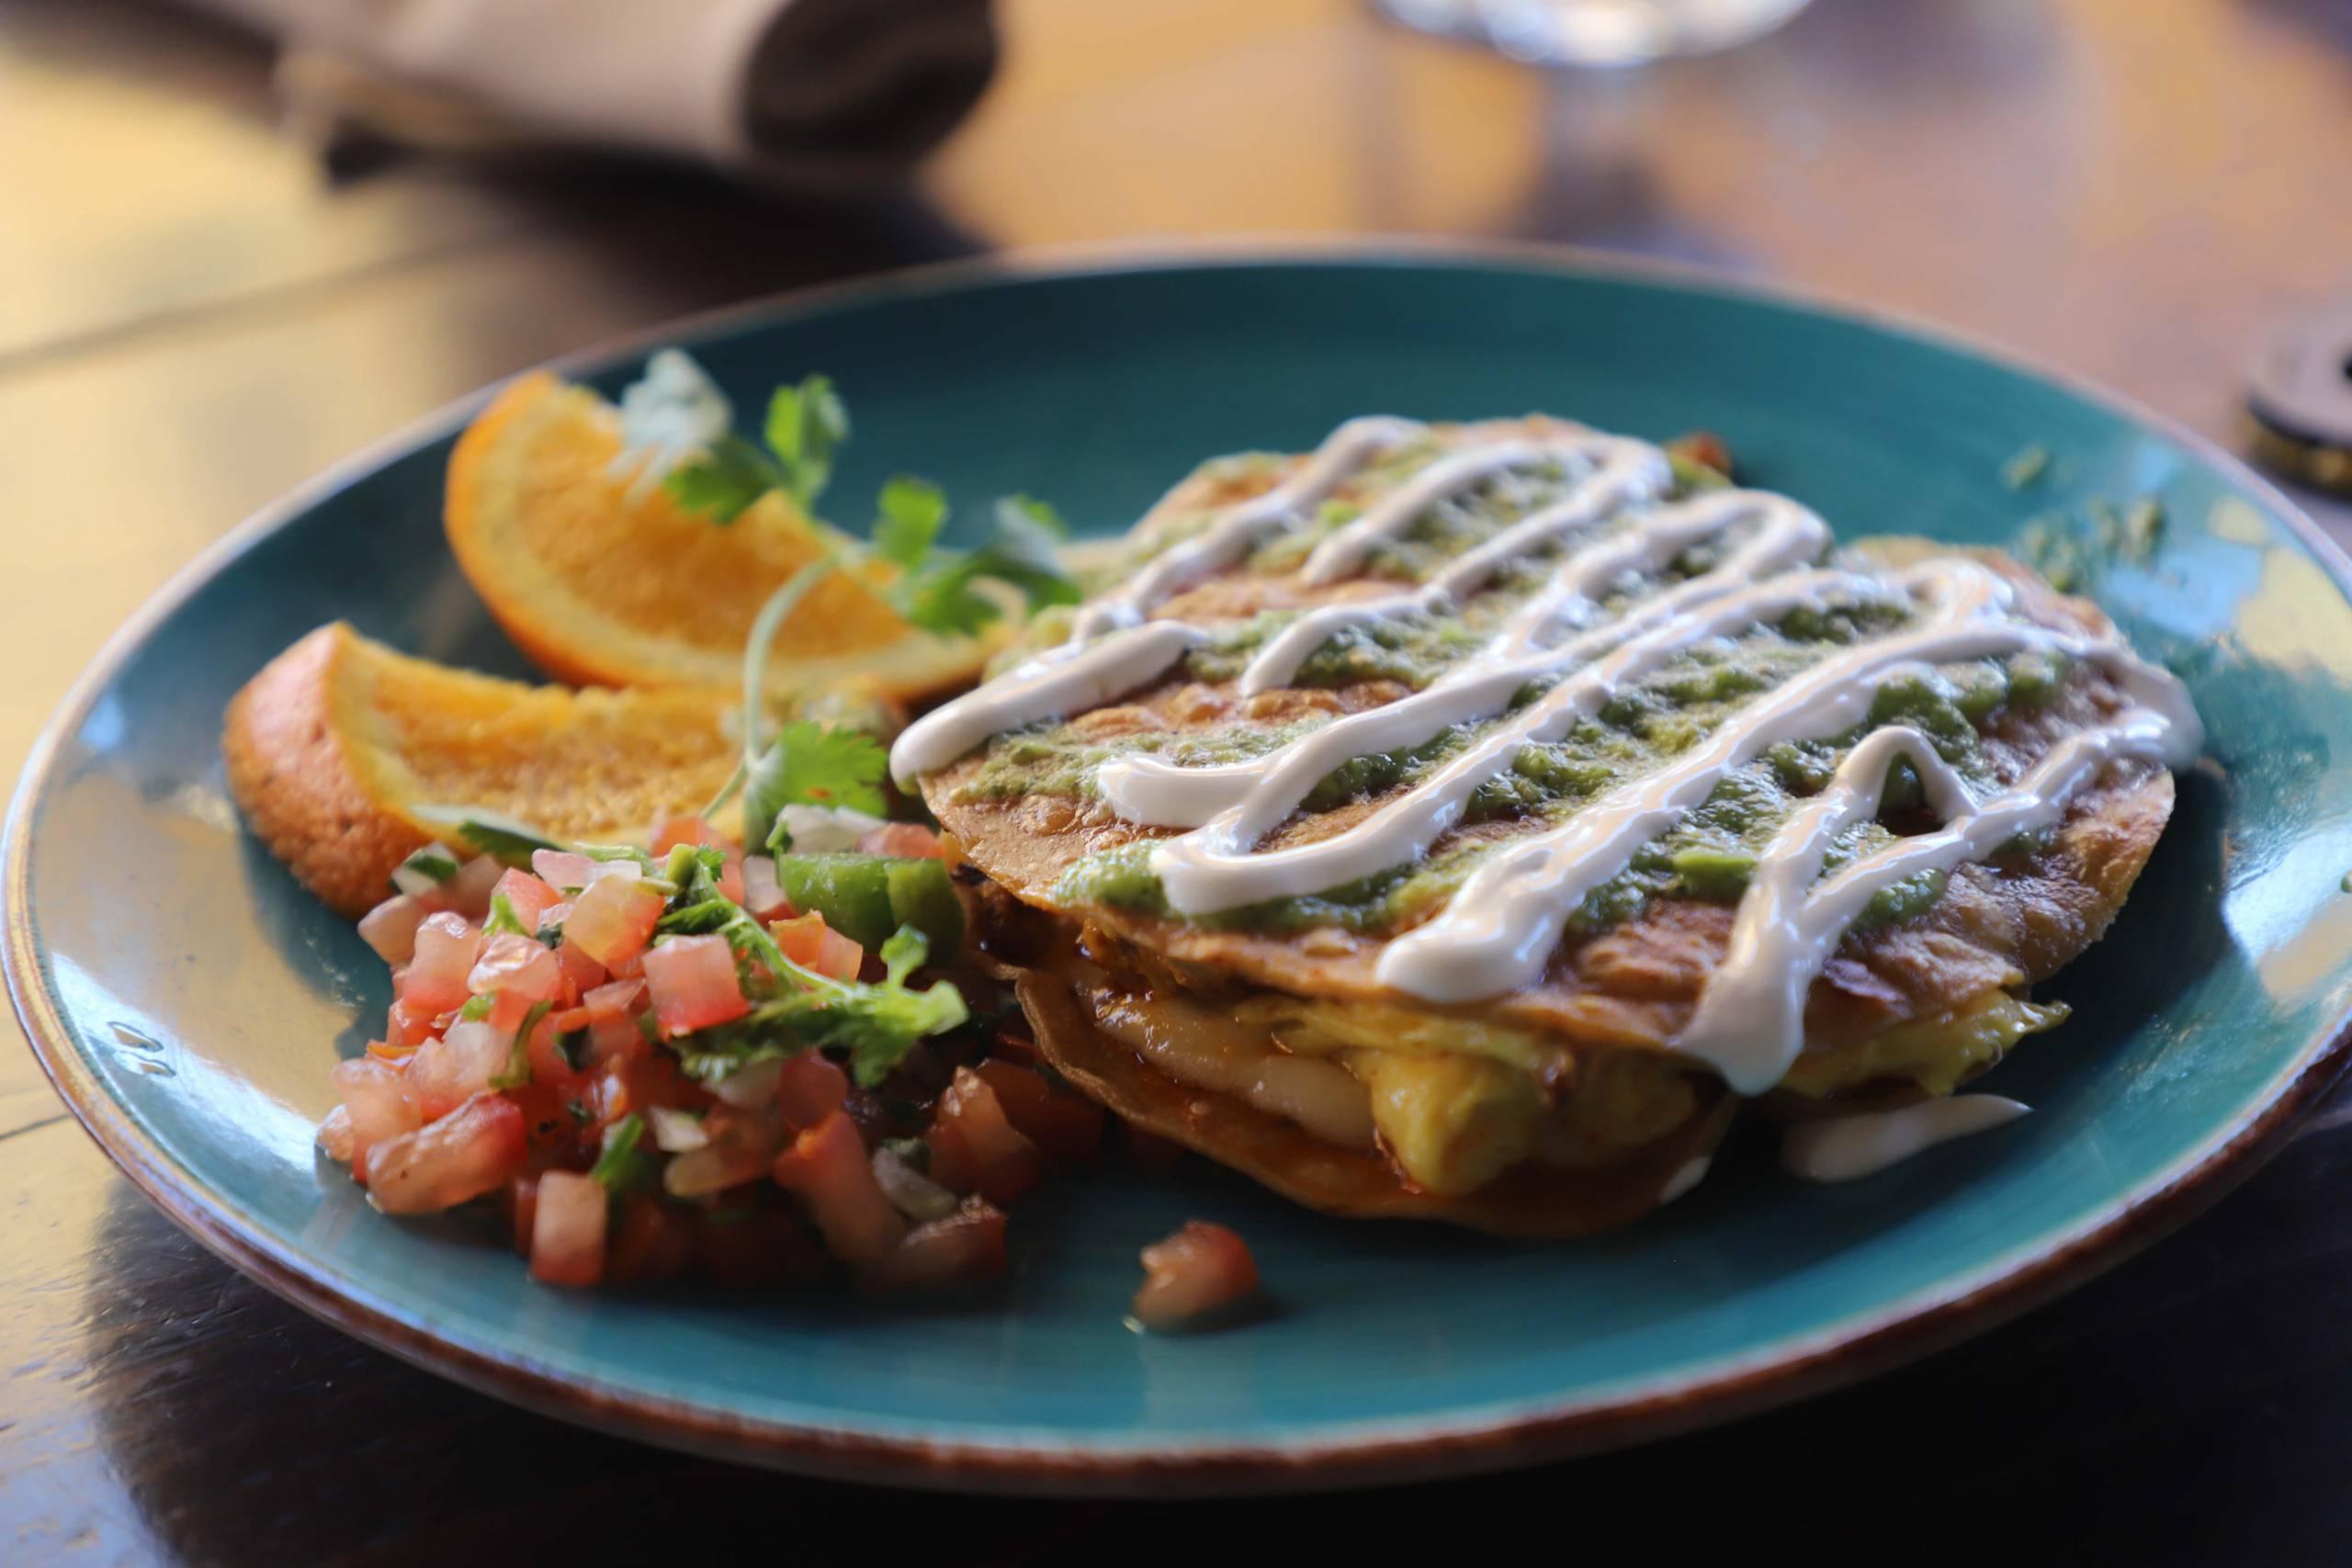 The mulita de chorizo, streaked with crema, with pico de gallo and slices of orange on the side.